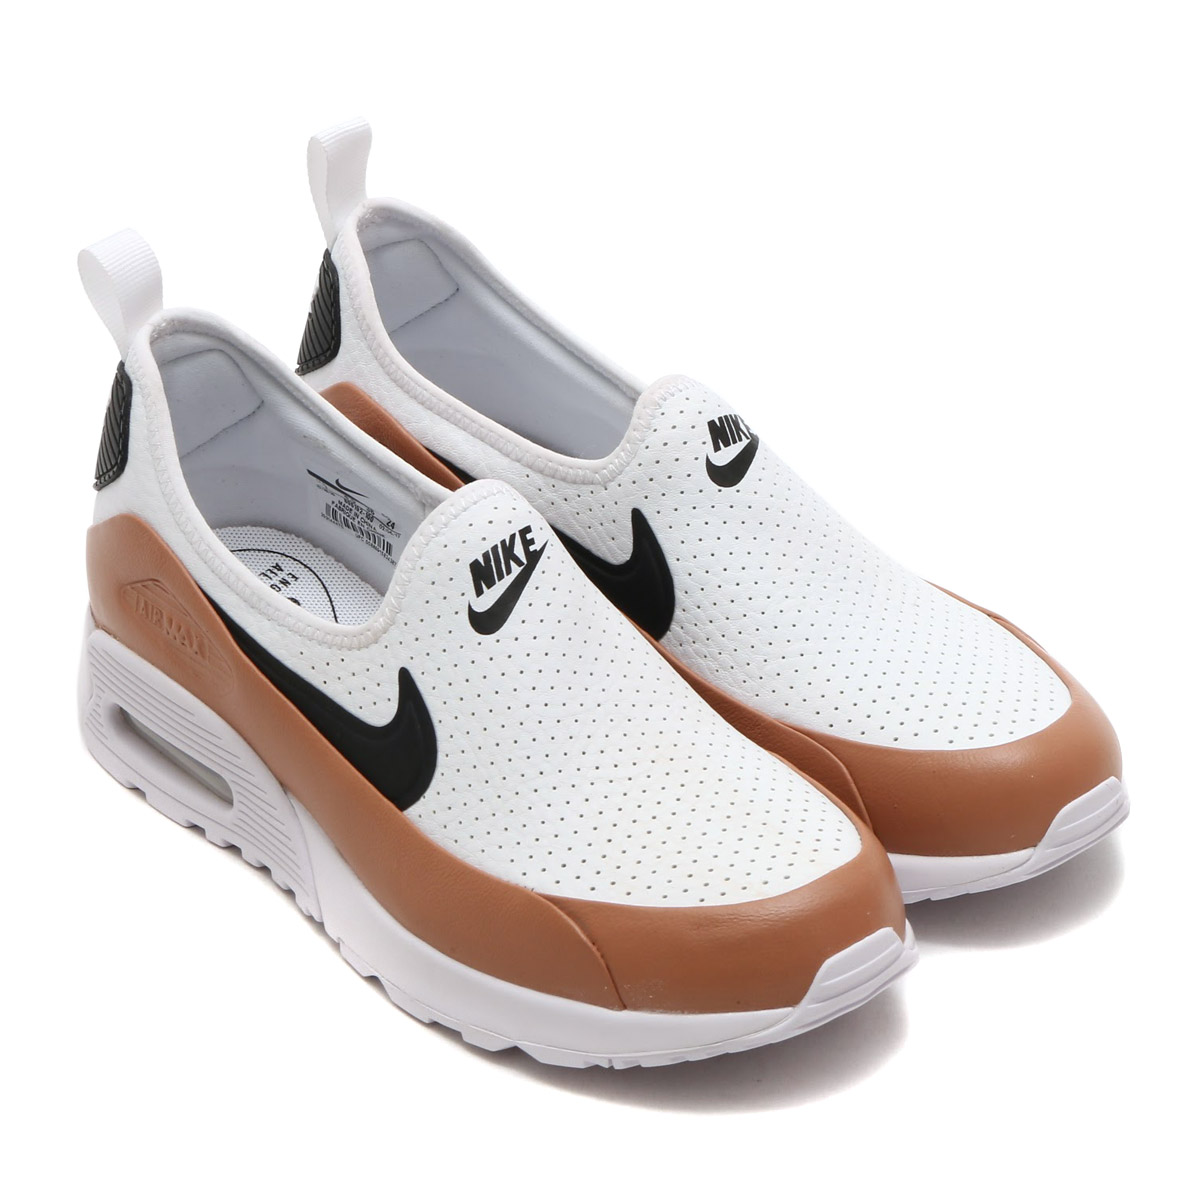 8536f552bfa6 NIKE W AIR MAX 90 ULTRA 2.0 EASE (Nike women Air Max 90 ultra 2.0 Eads)  (WHITE BLACK-DUSTED CLAY) 17SU-S